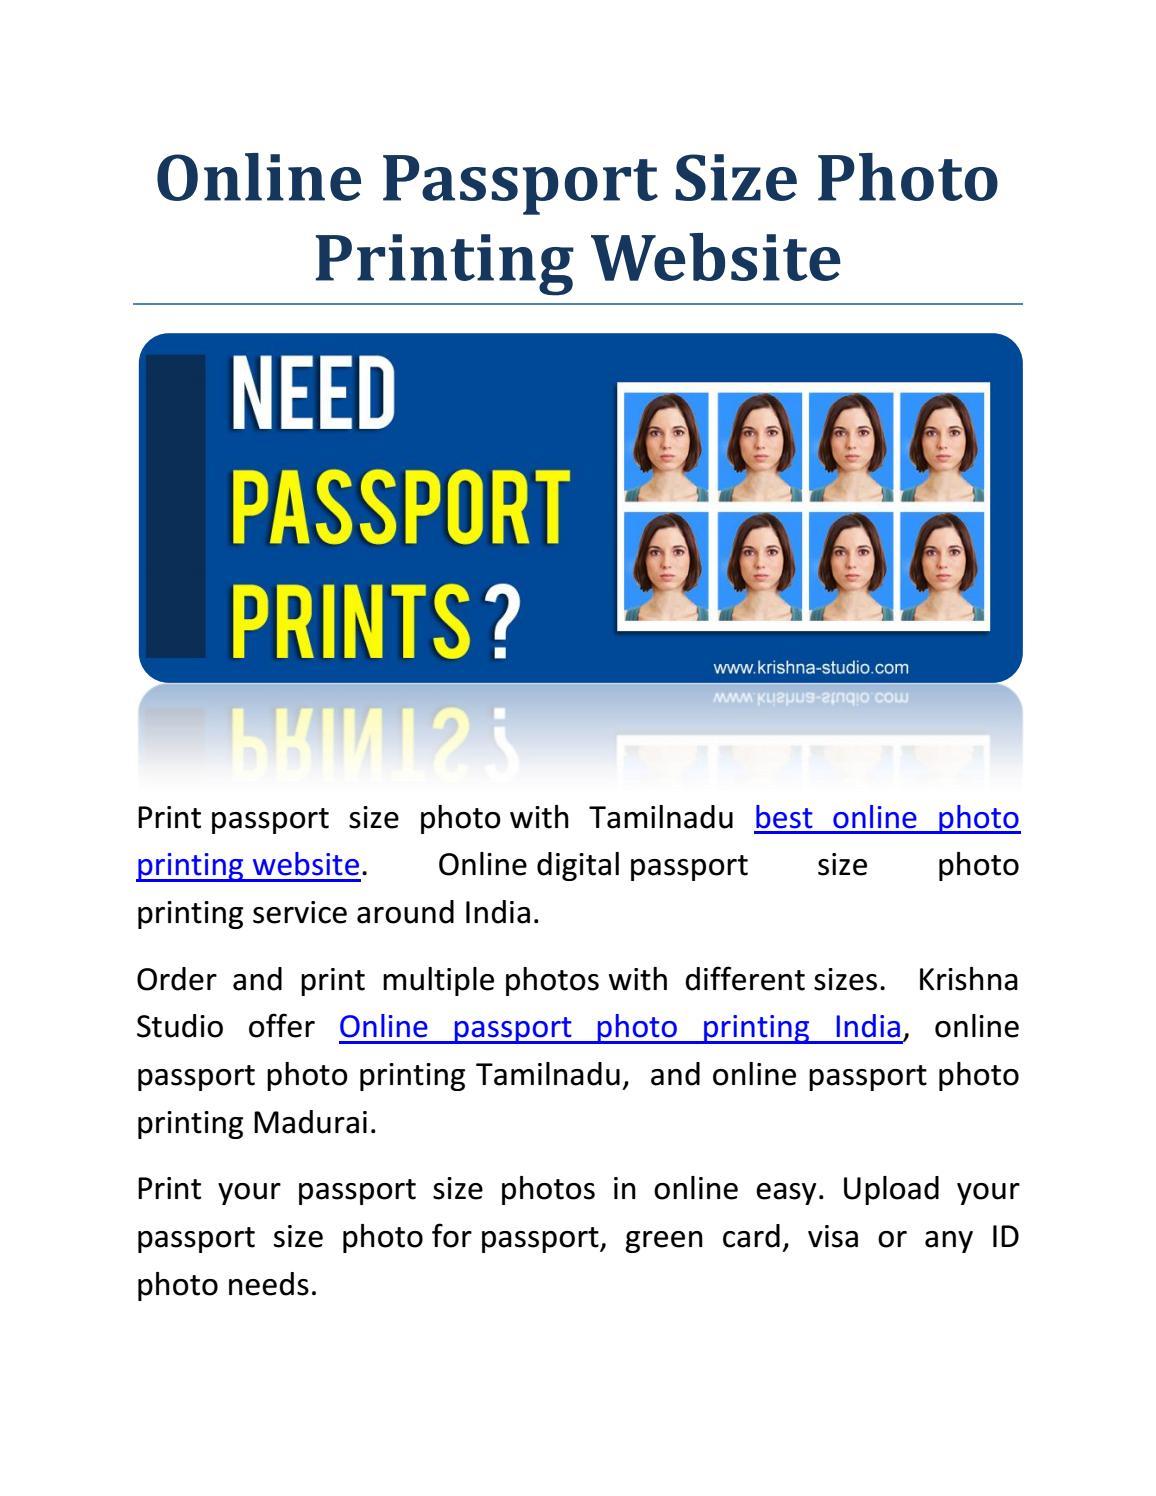 Online Digital Passport Size Photo Printing Service By Krishna Studio Issuu